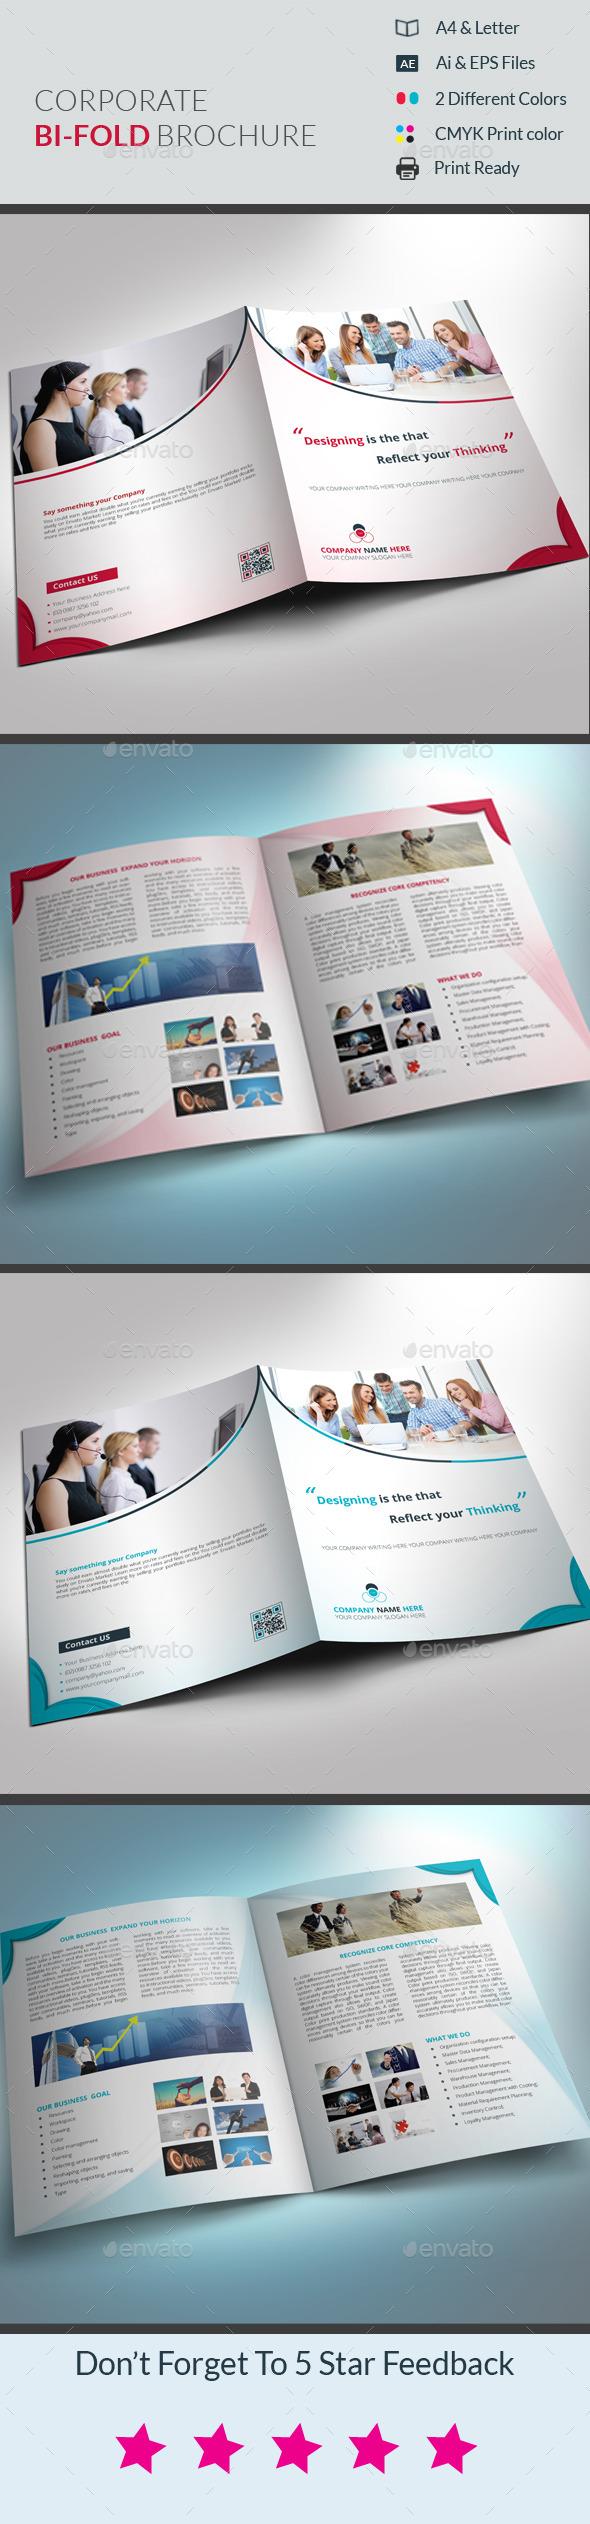 GraphicRiver Corporate Bi-Fold Brochure 10246692